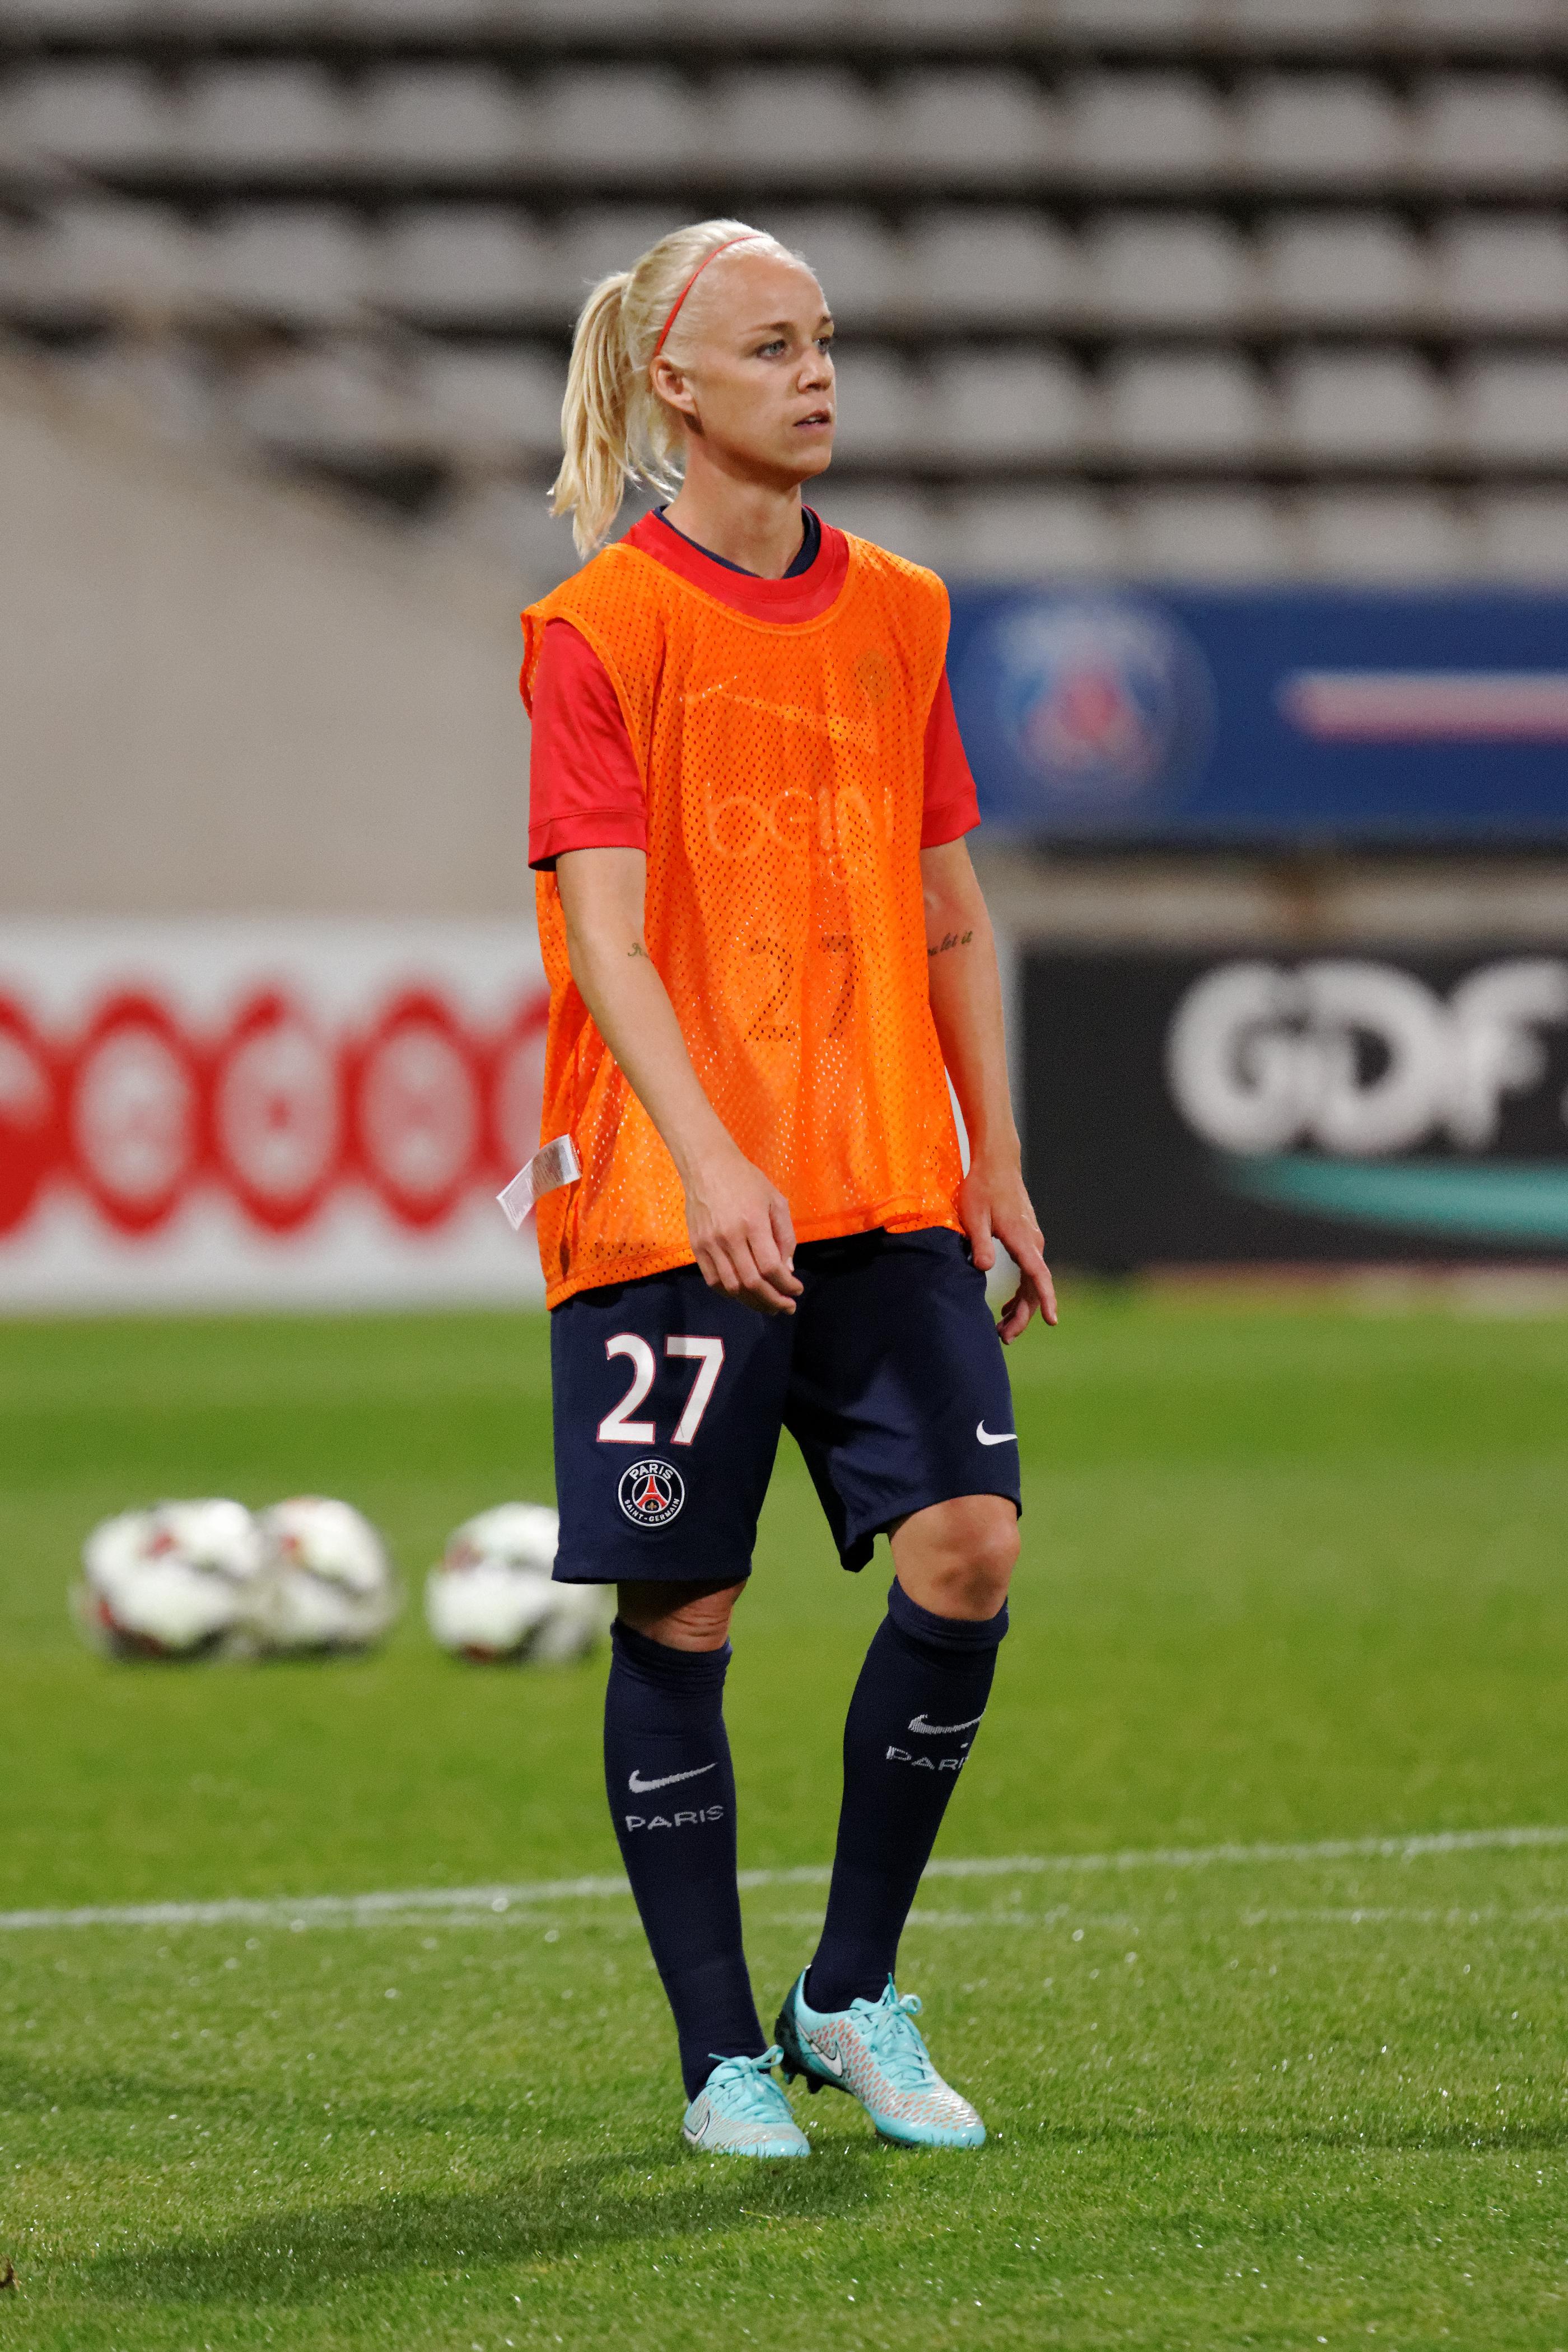 File:20141015 - PSG-Twente - Caroline Seger 03.jpg - Wikimedia Commons